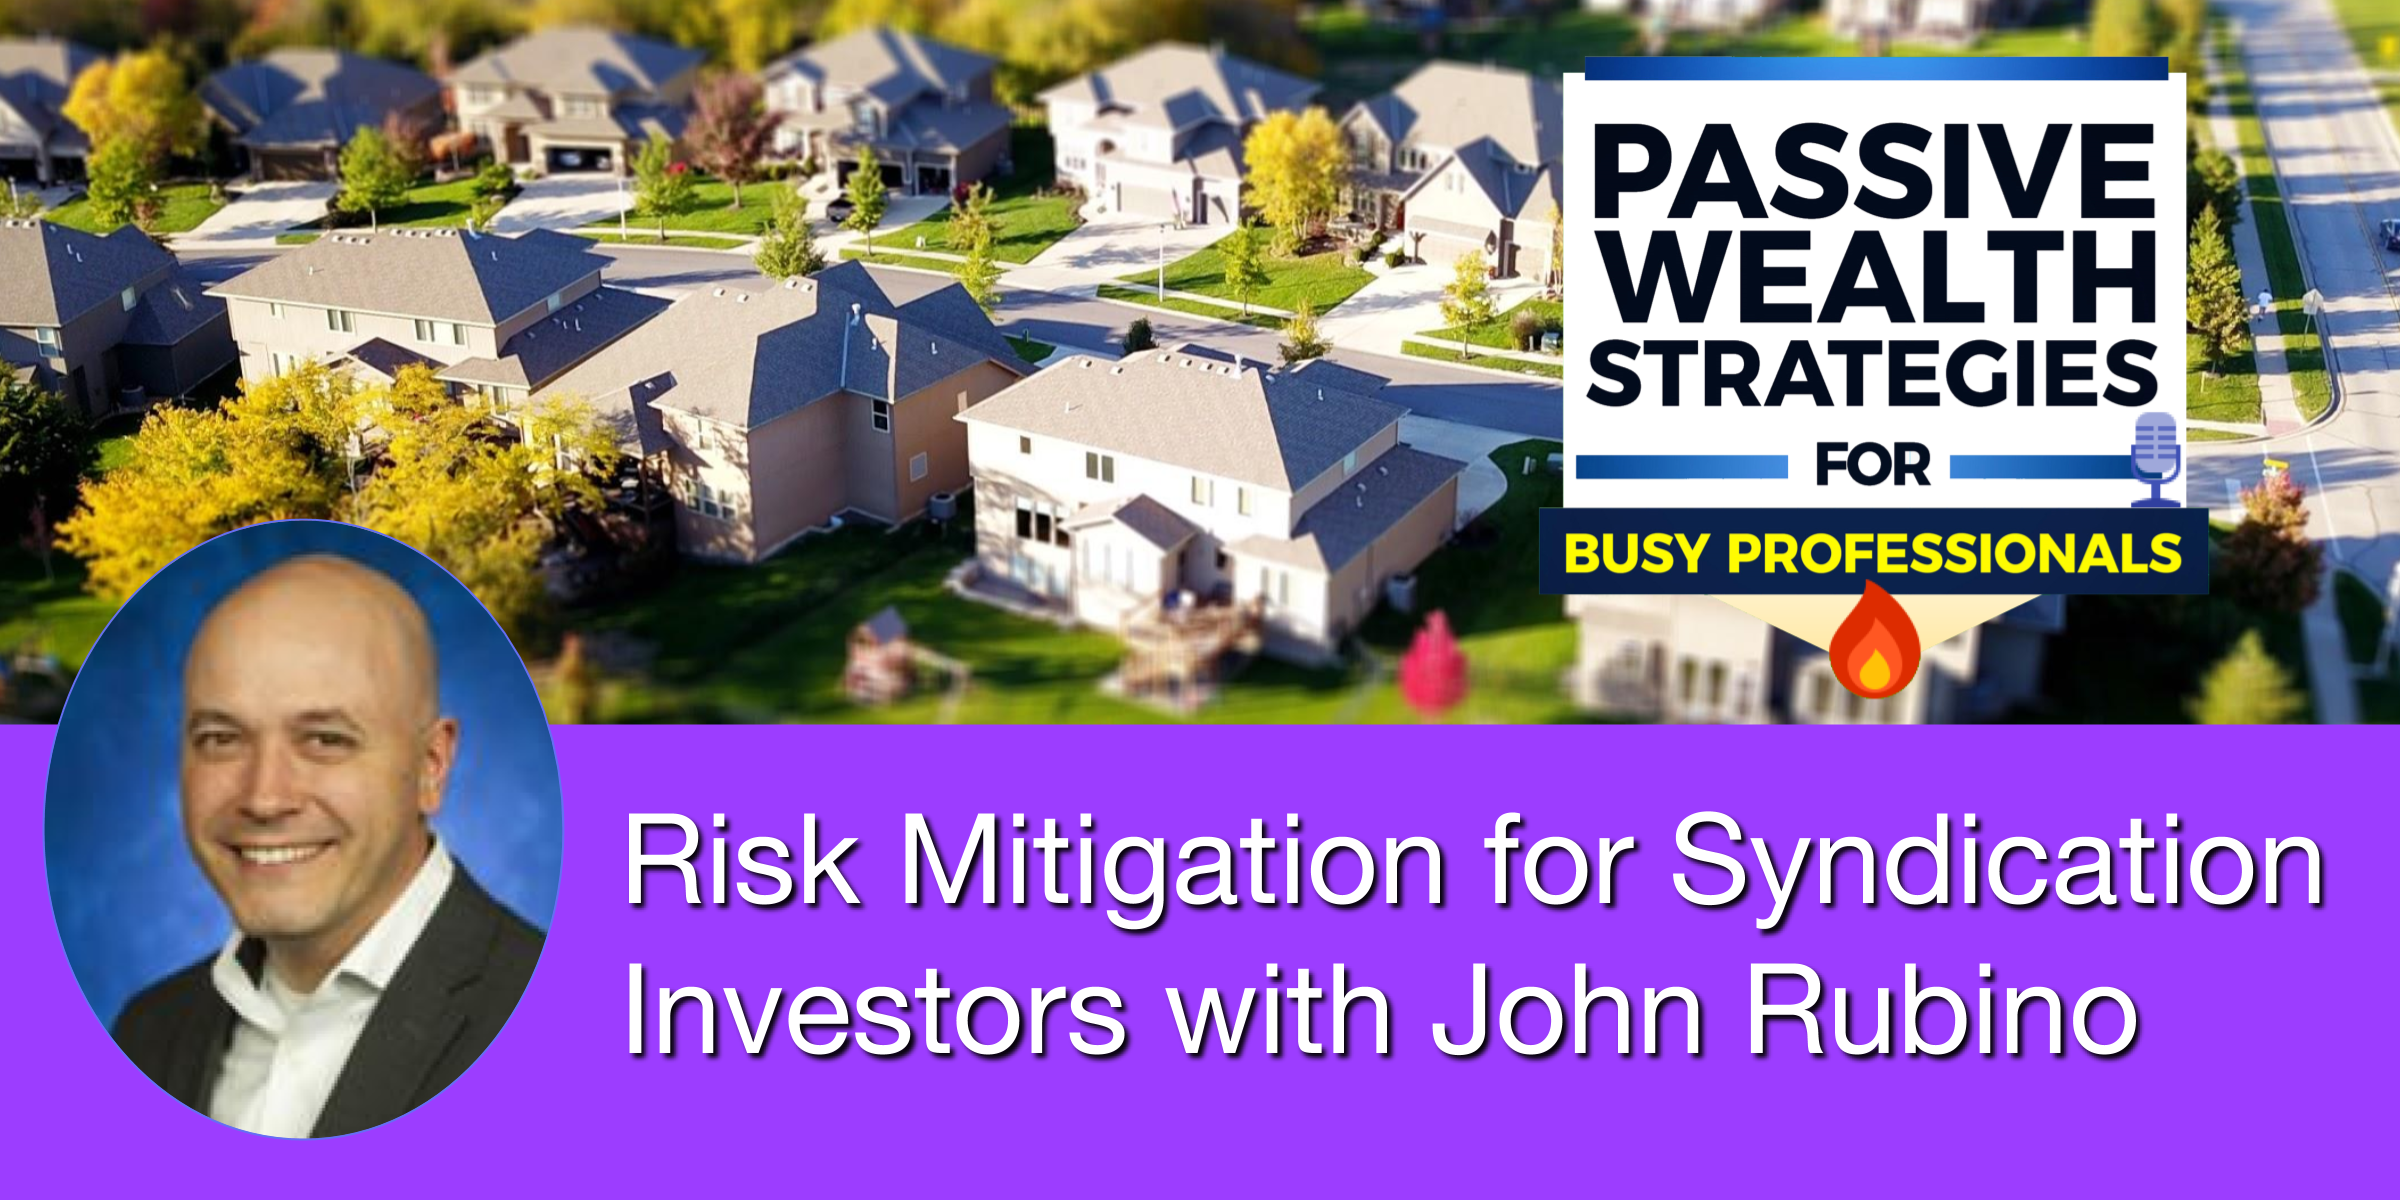 Risk Mitigation for Syndication Investors with John Rubino